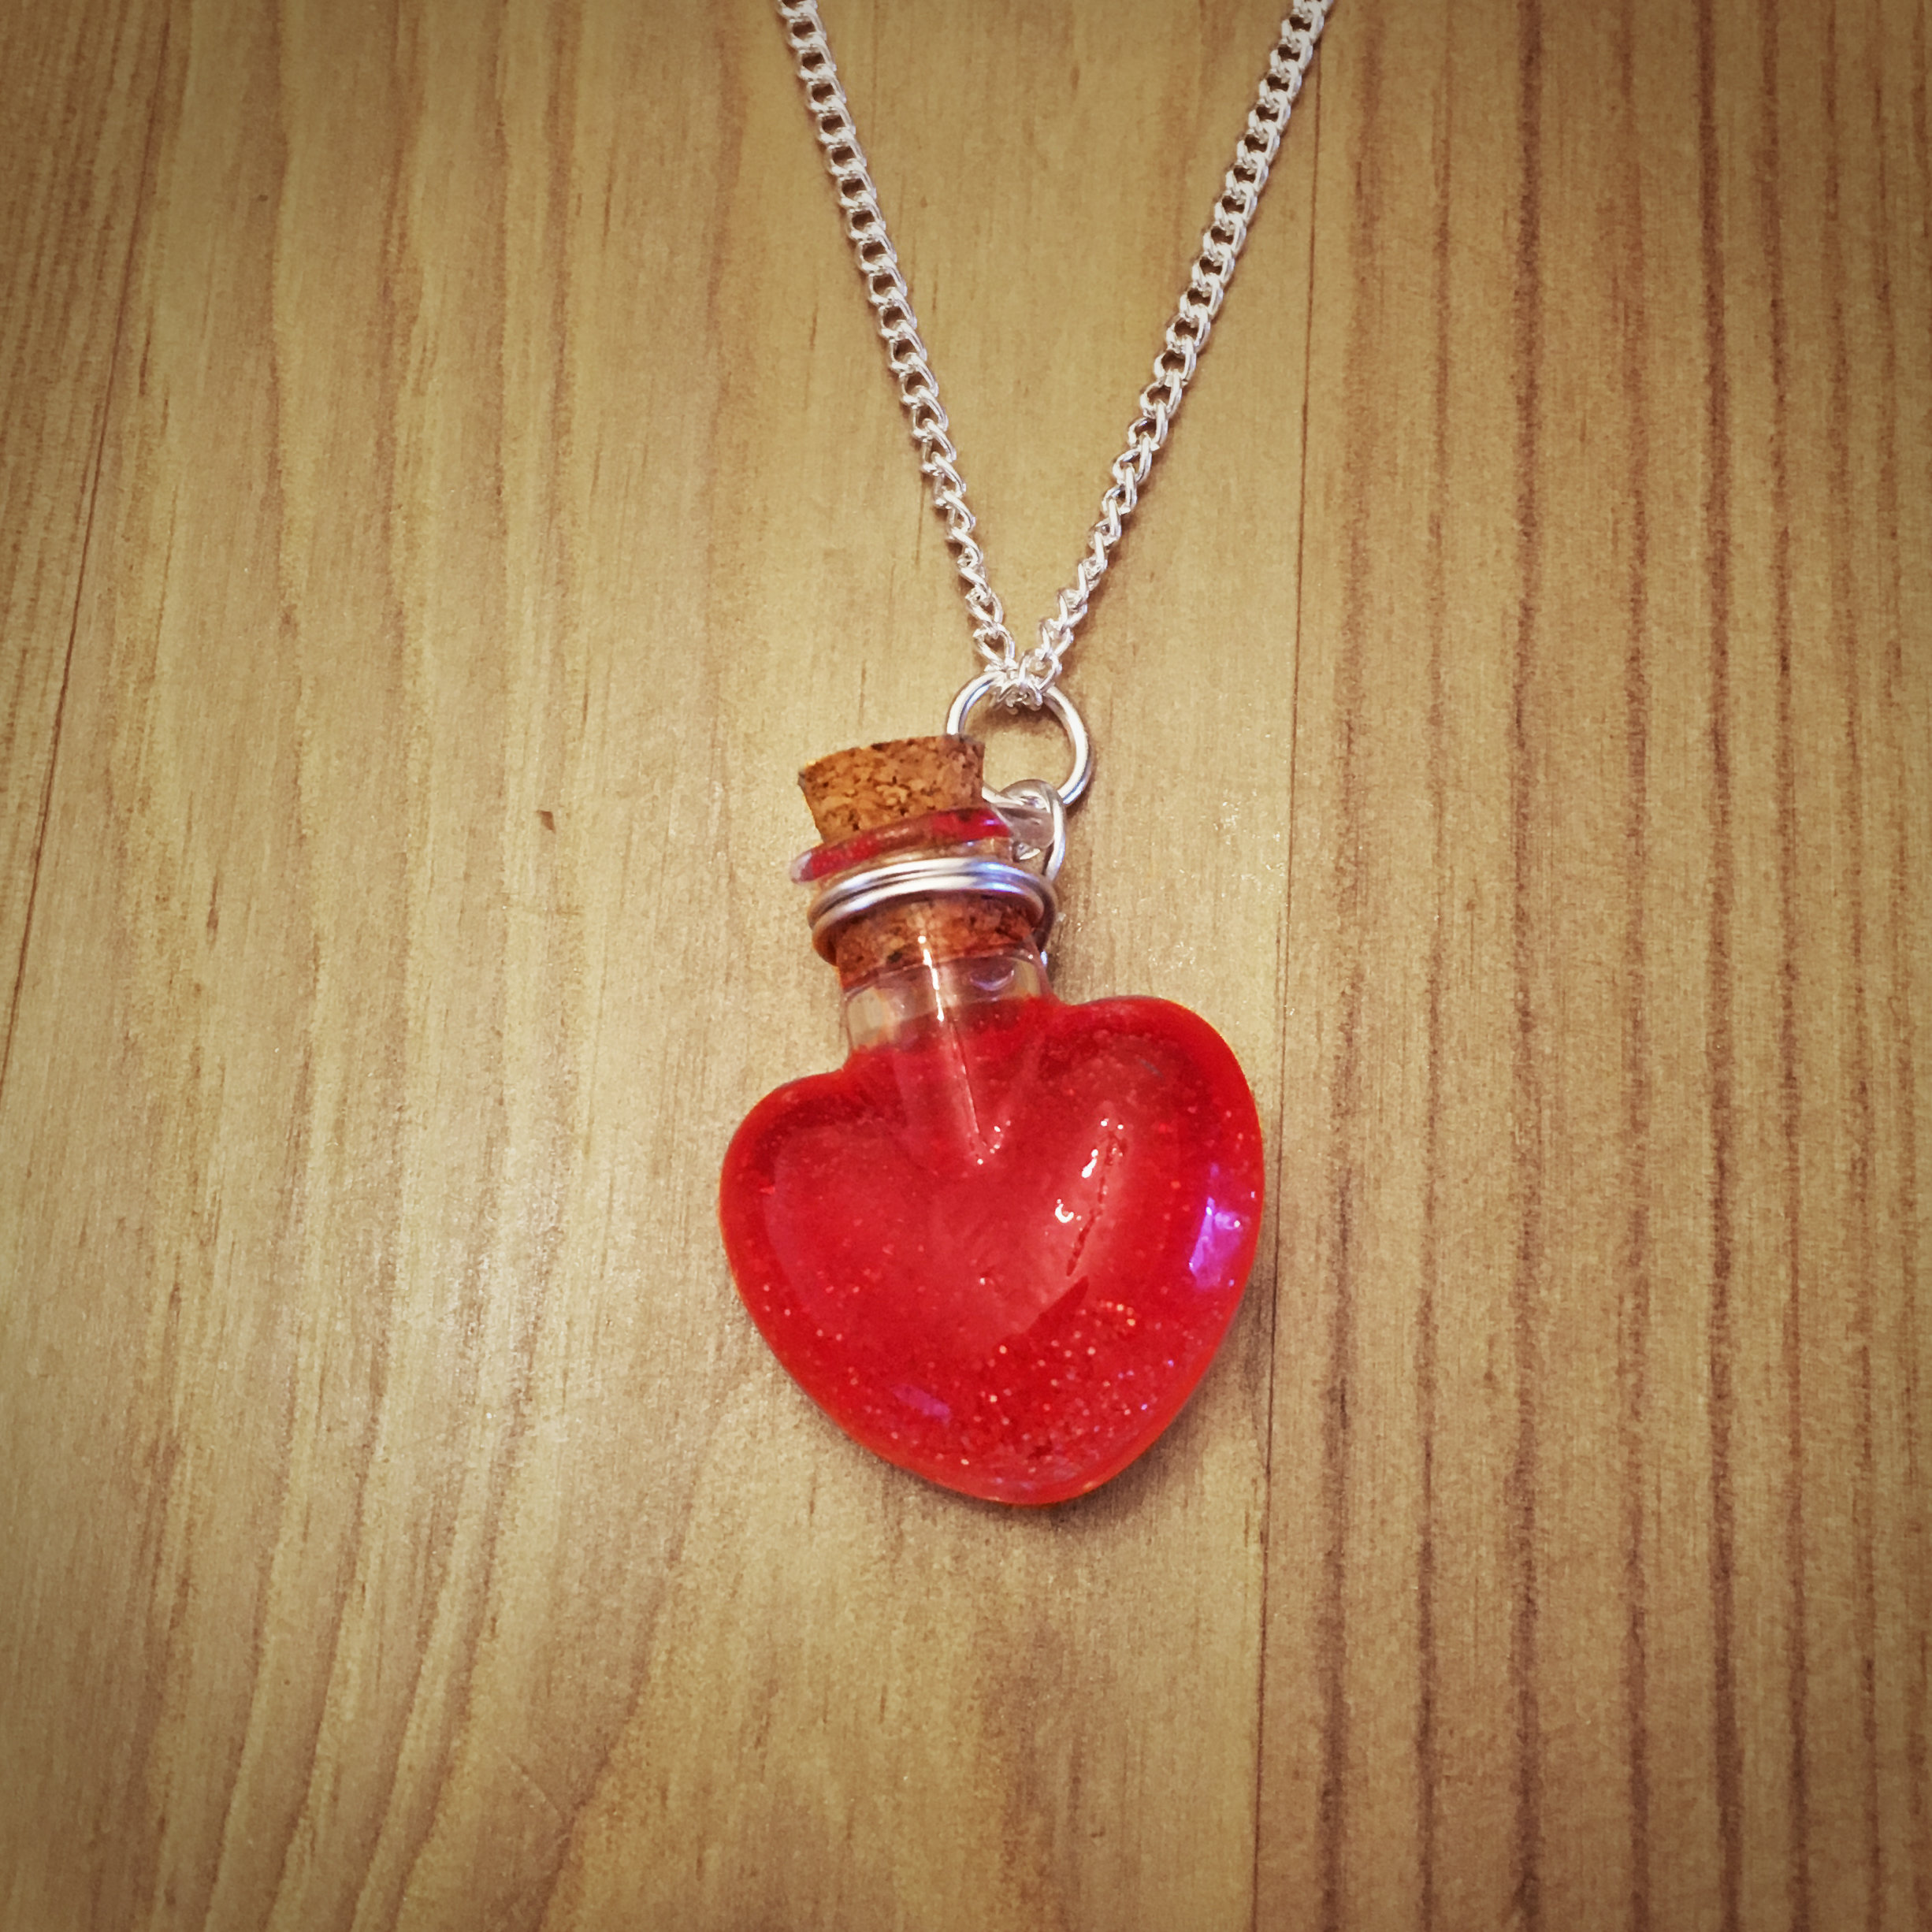 Potion Necklace - Heart Potion001